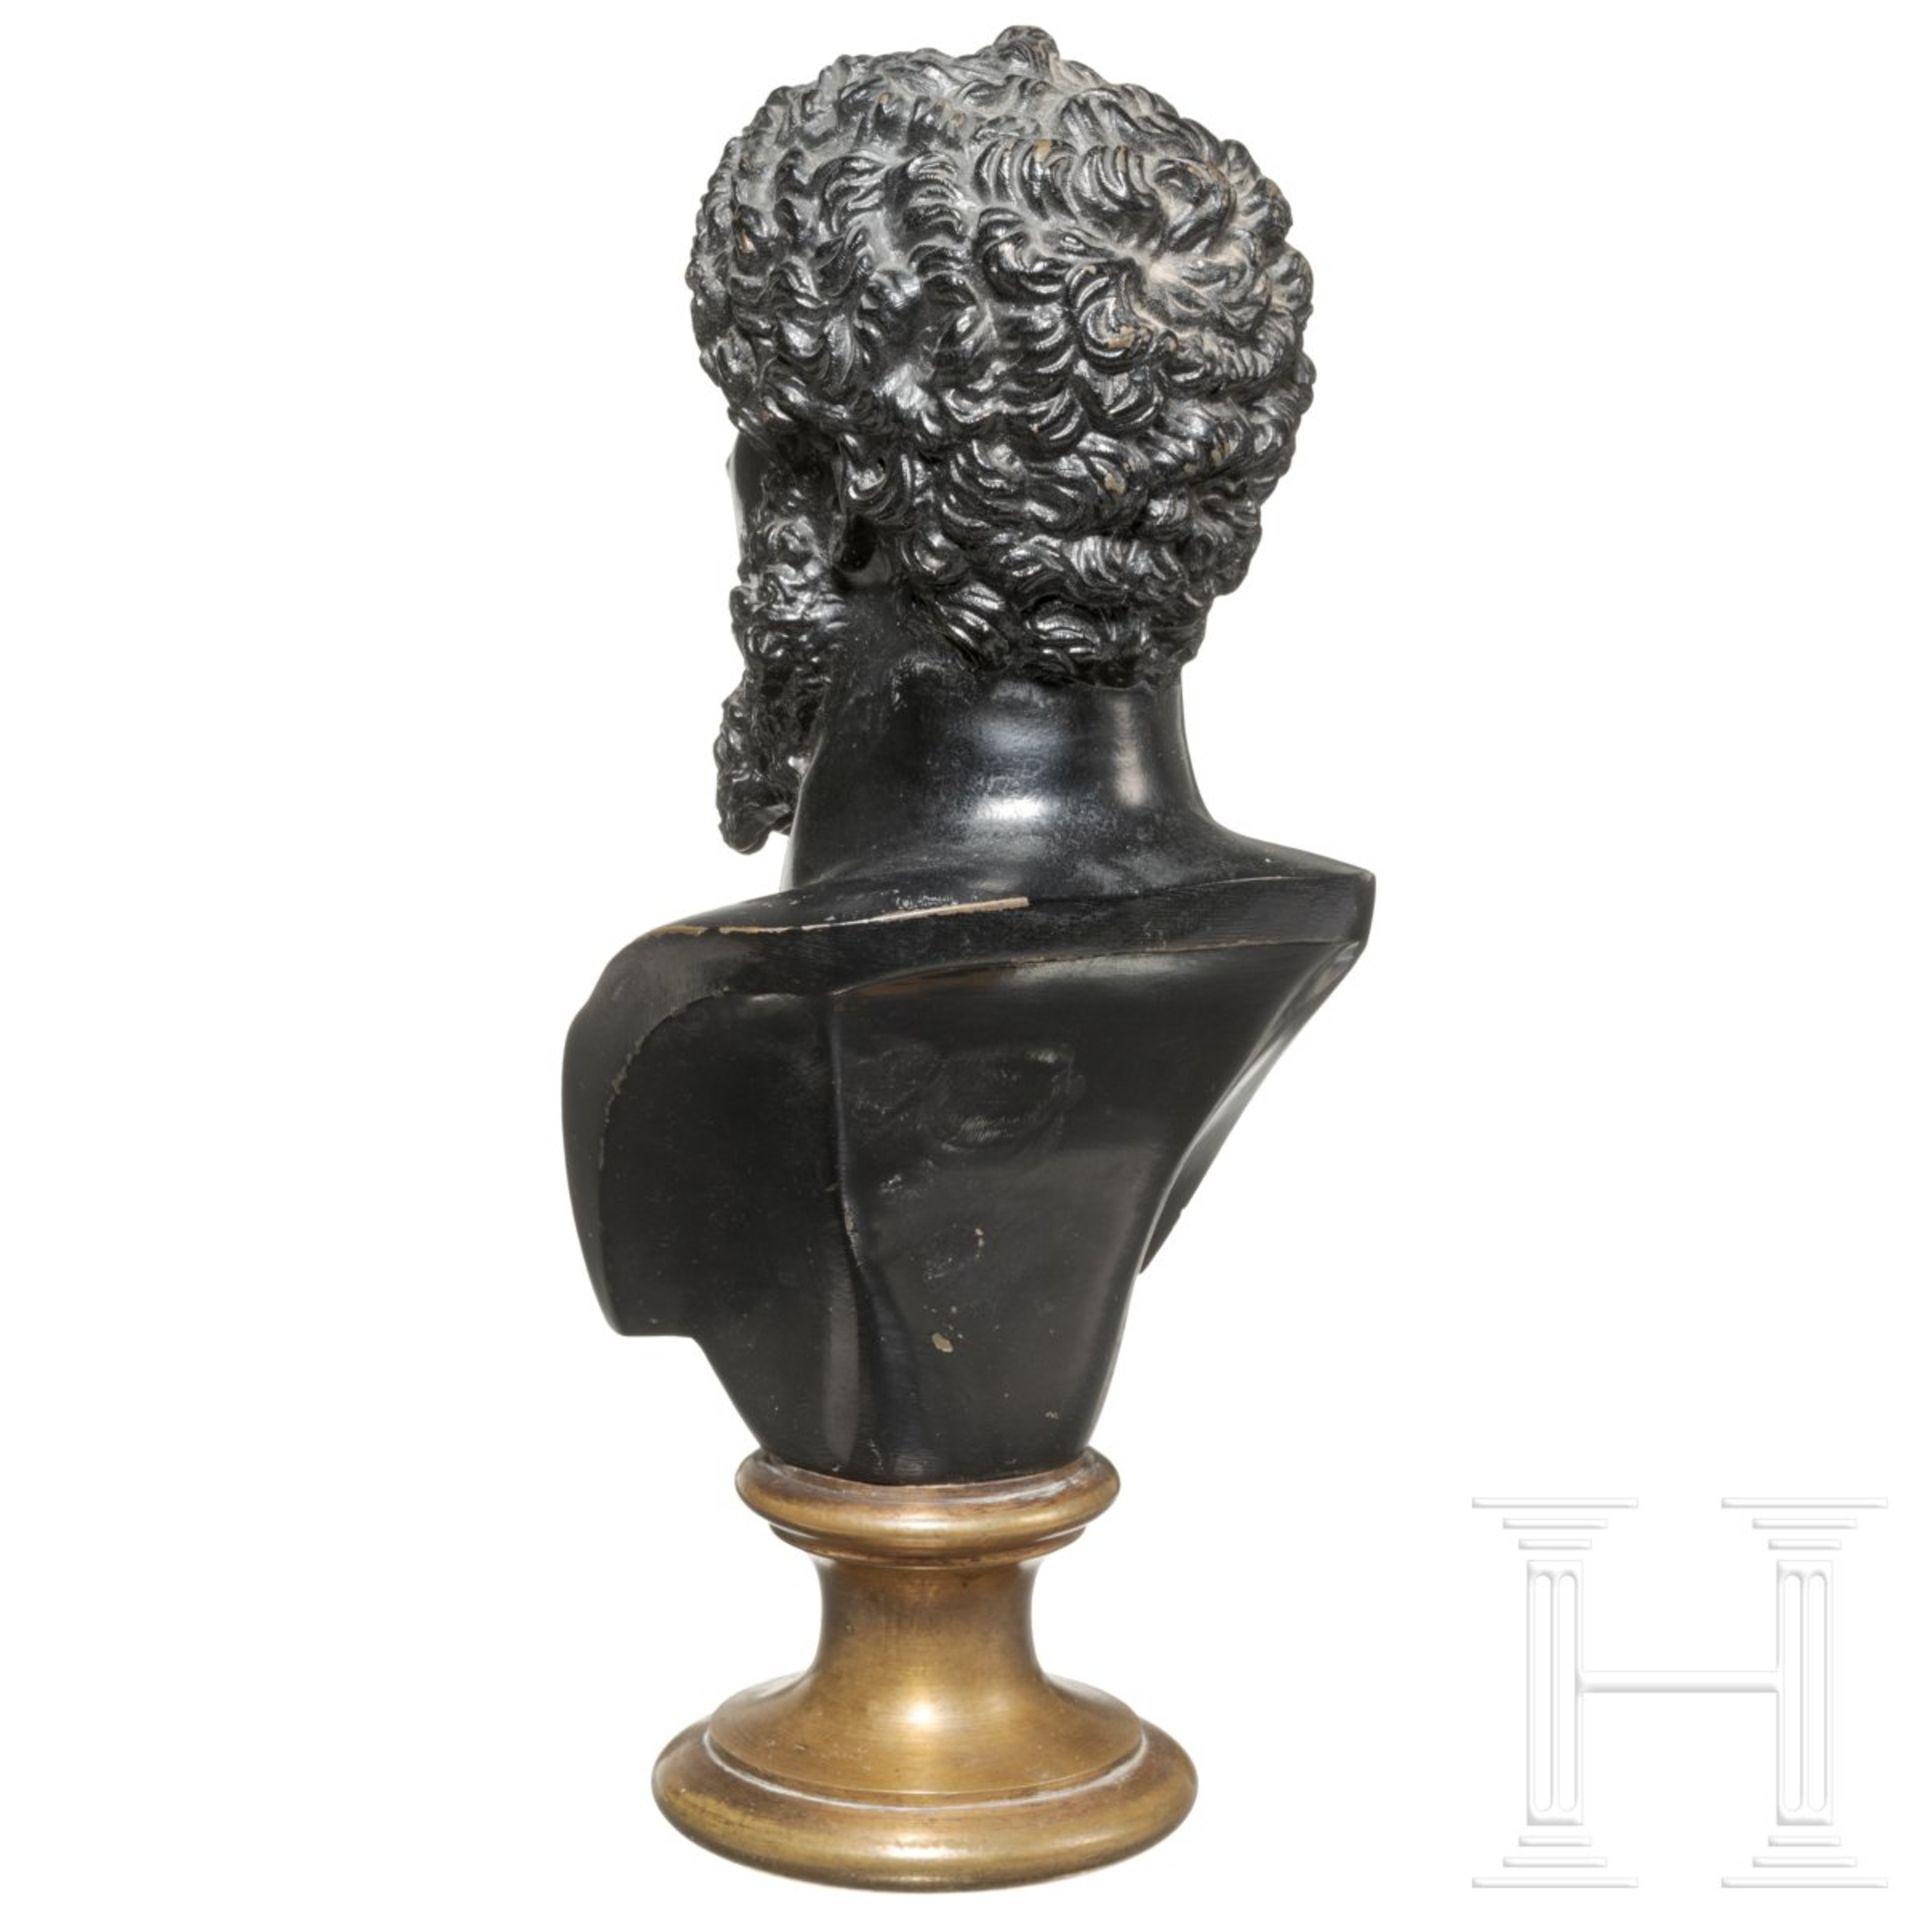 Bronzebüste des Kaisers Lucius Verus - Image 3 of 4